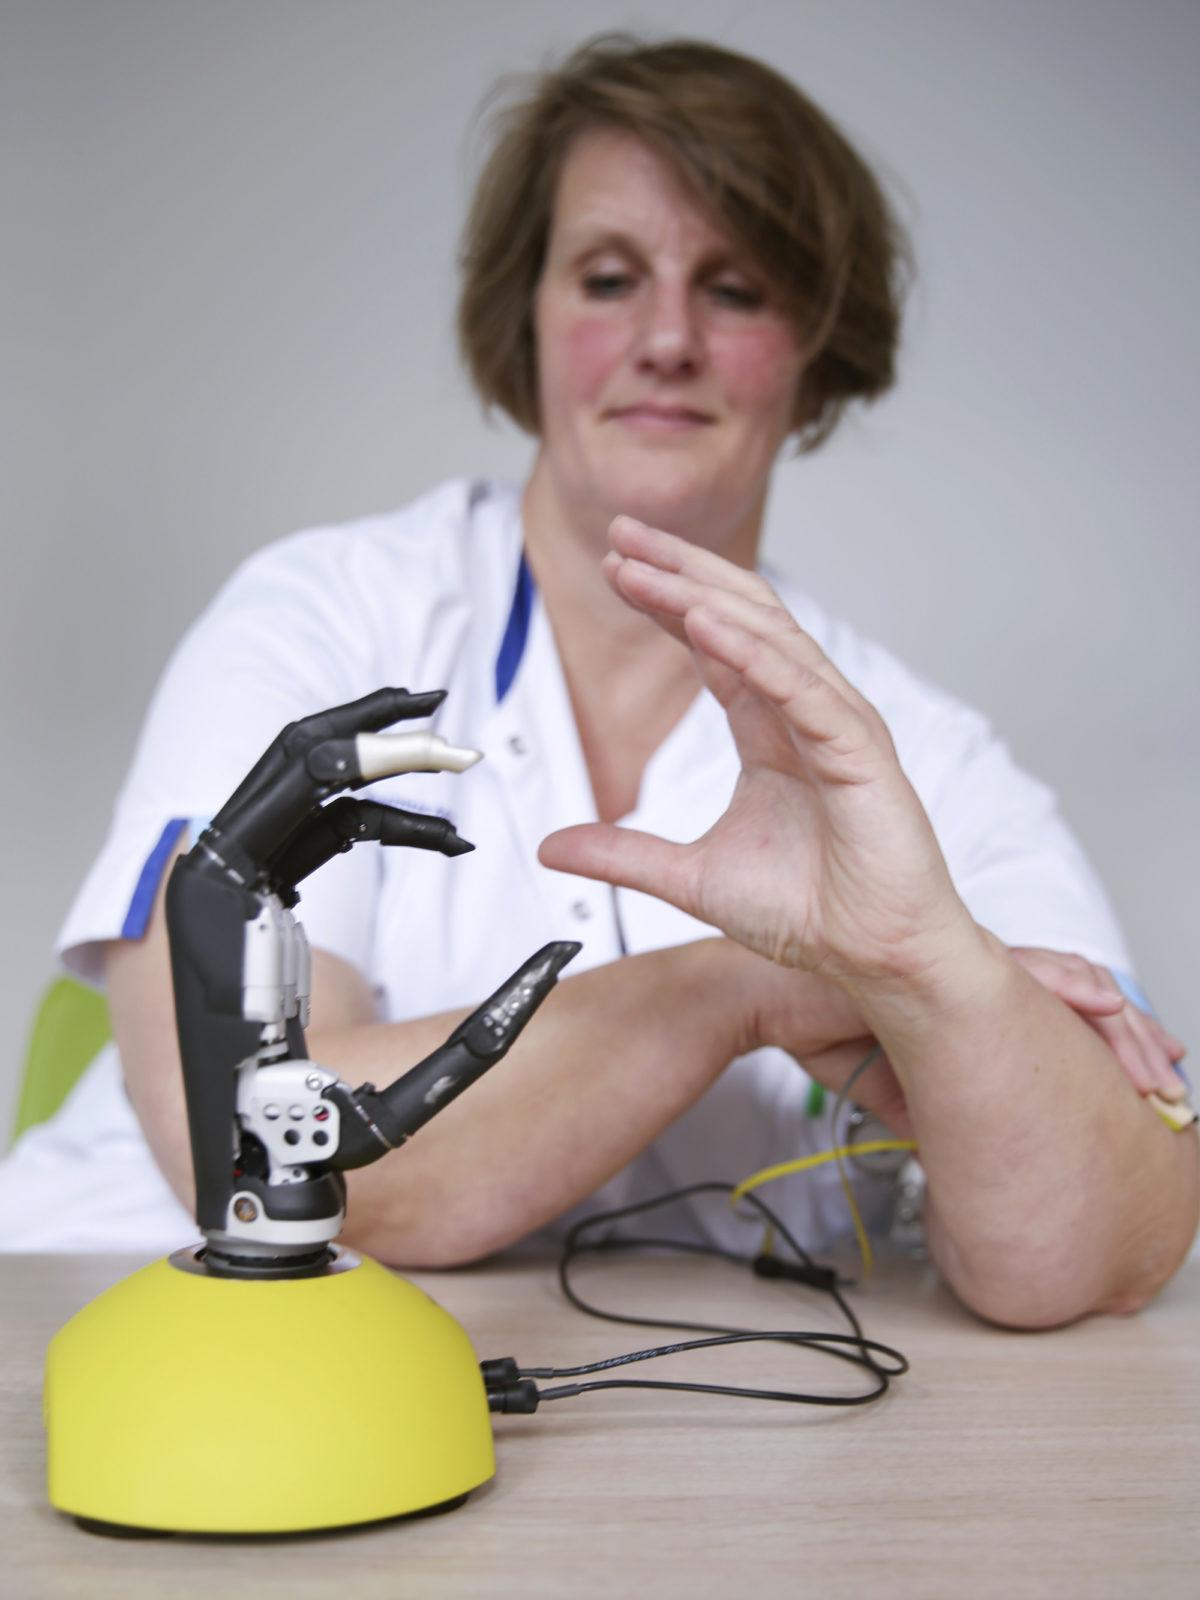 reportage protheses Bionische hand 1 – Sanne